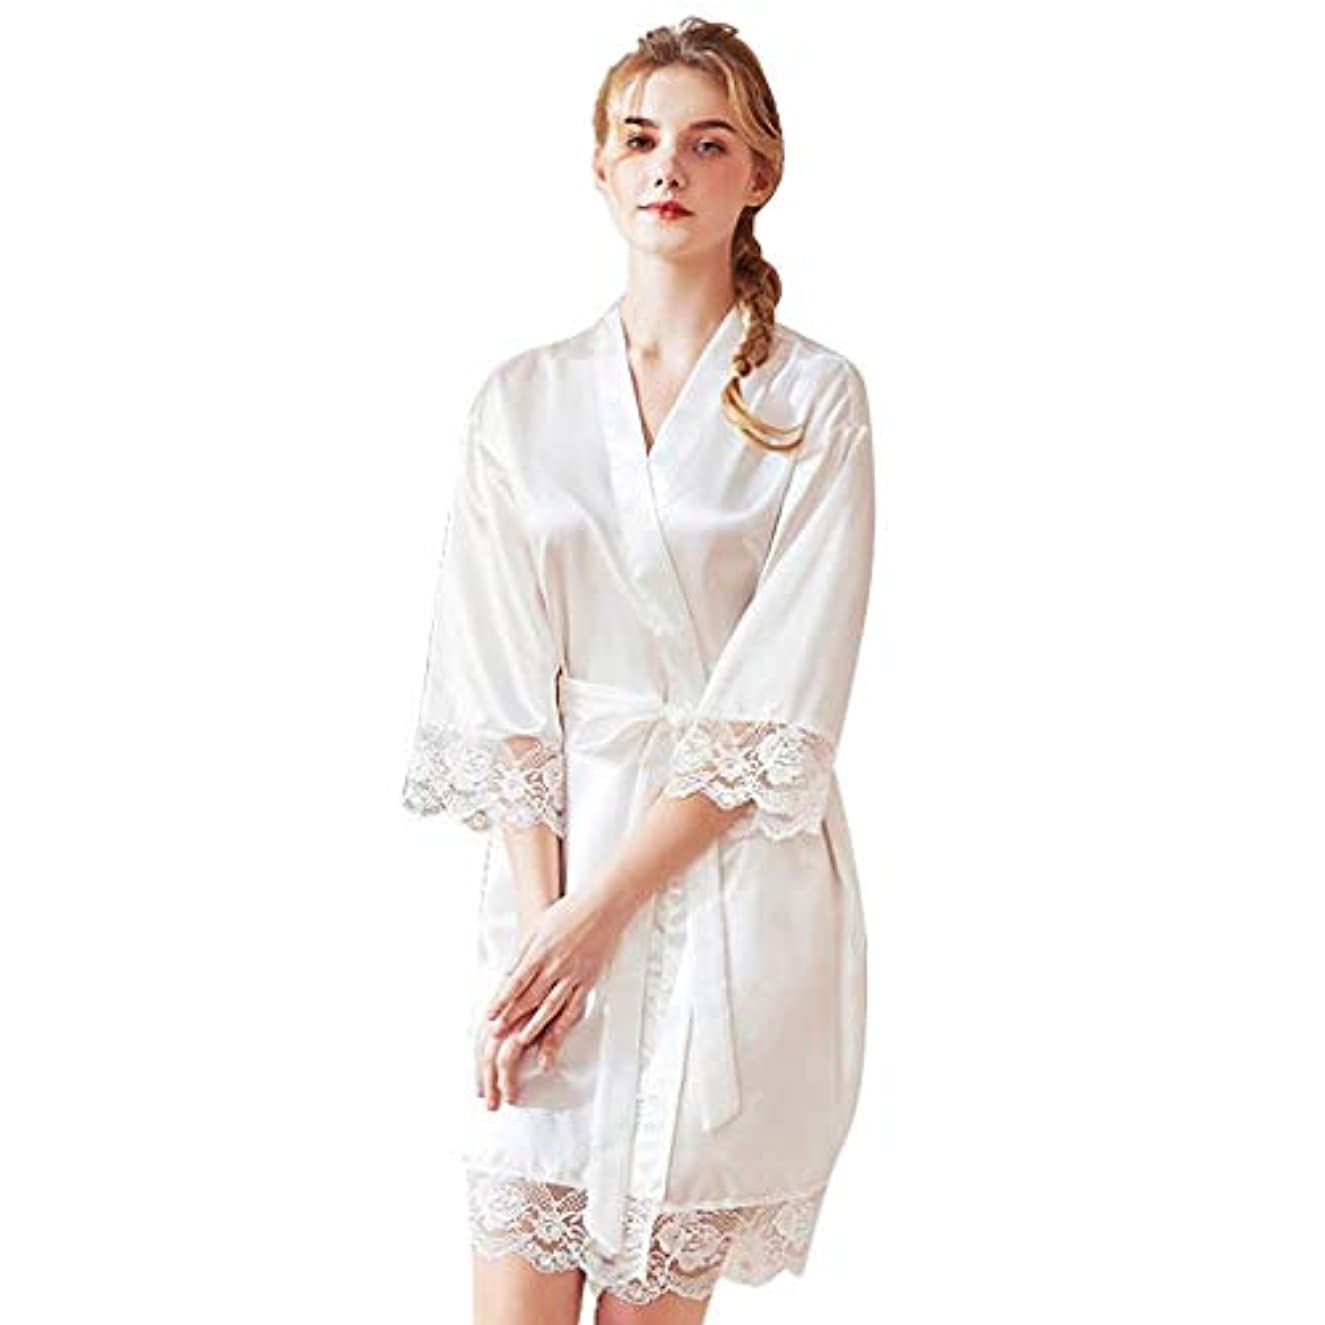 Topgee Women Bride Dressing Gown Silk Ladies Pajamas Lingerie Robe Bathrobe